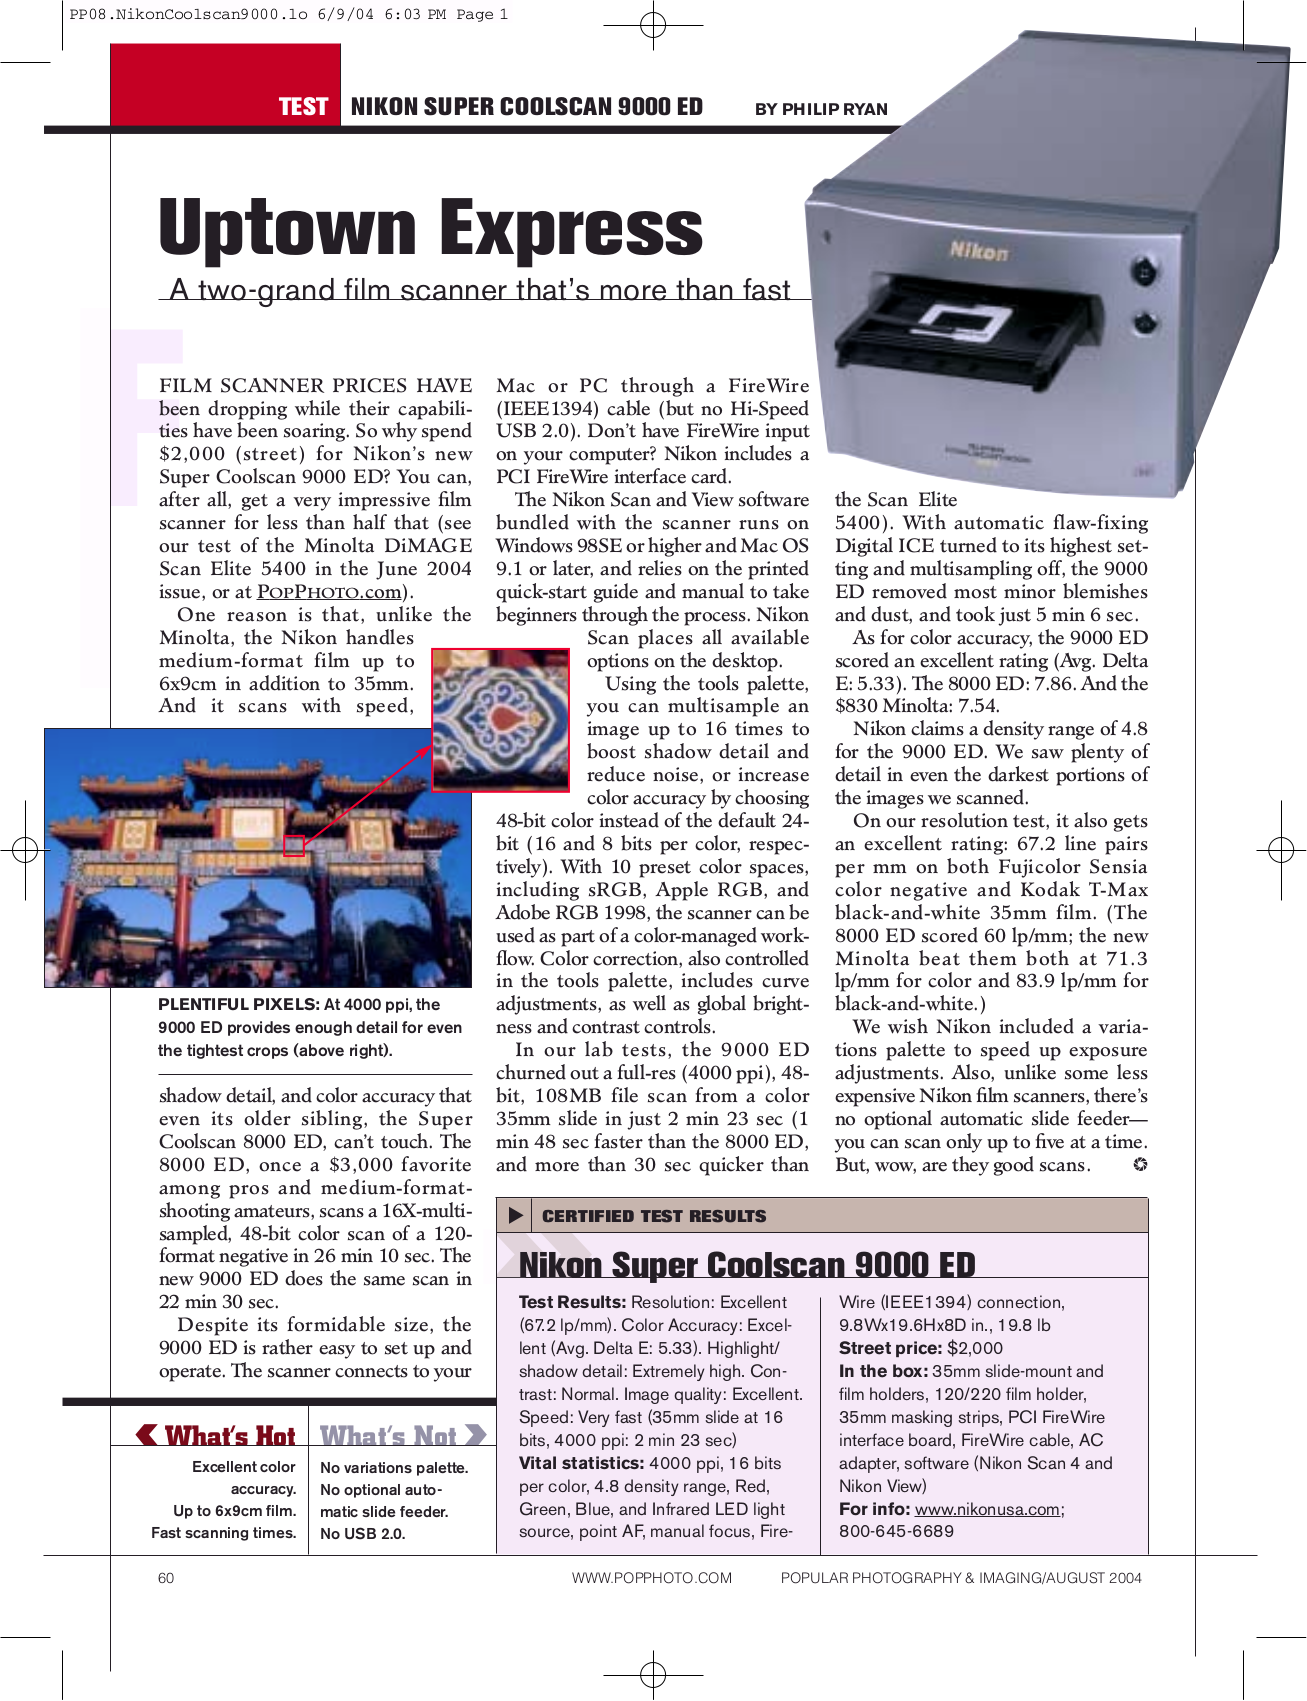 pdf for Nikon Scanner Coolscan 9000 ED manual